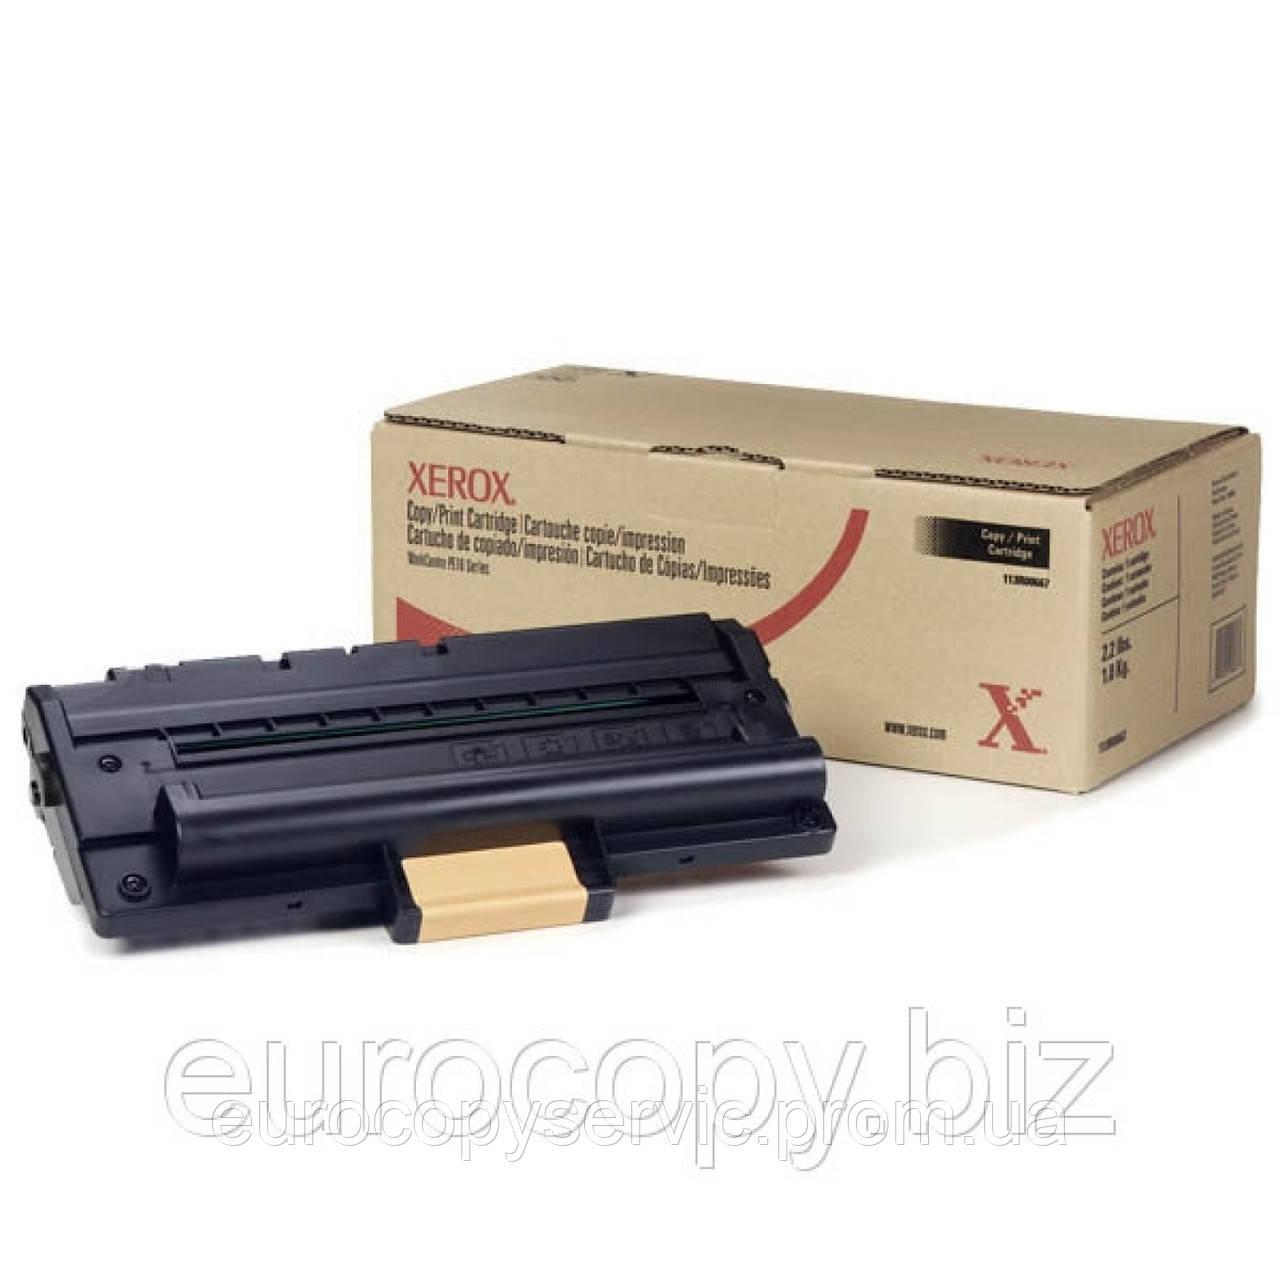 Тонер-картридж Xerox WC PE16/PE16e ресурс 3 500 стор. @ 5% (A4) (113R00667) Original